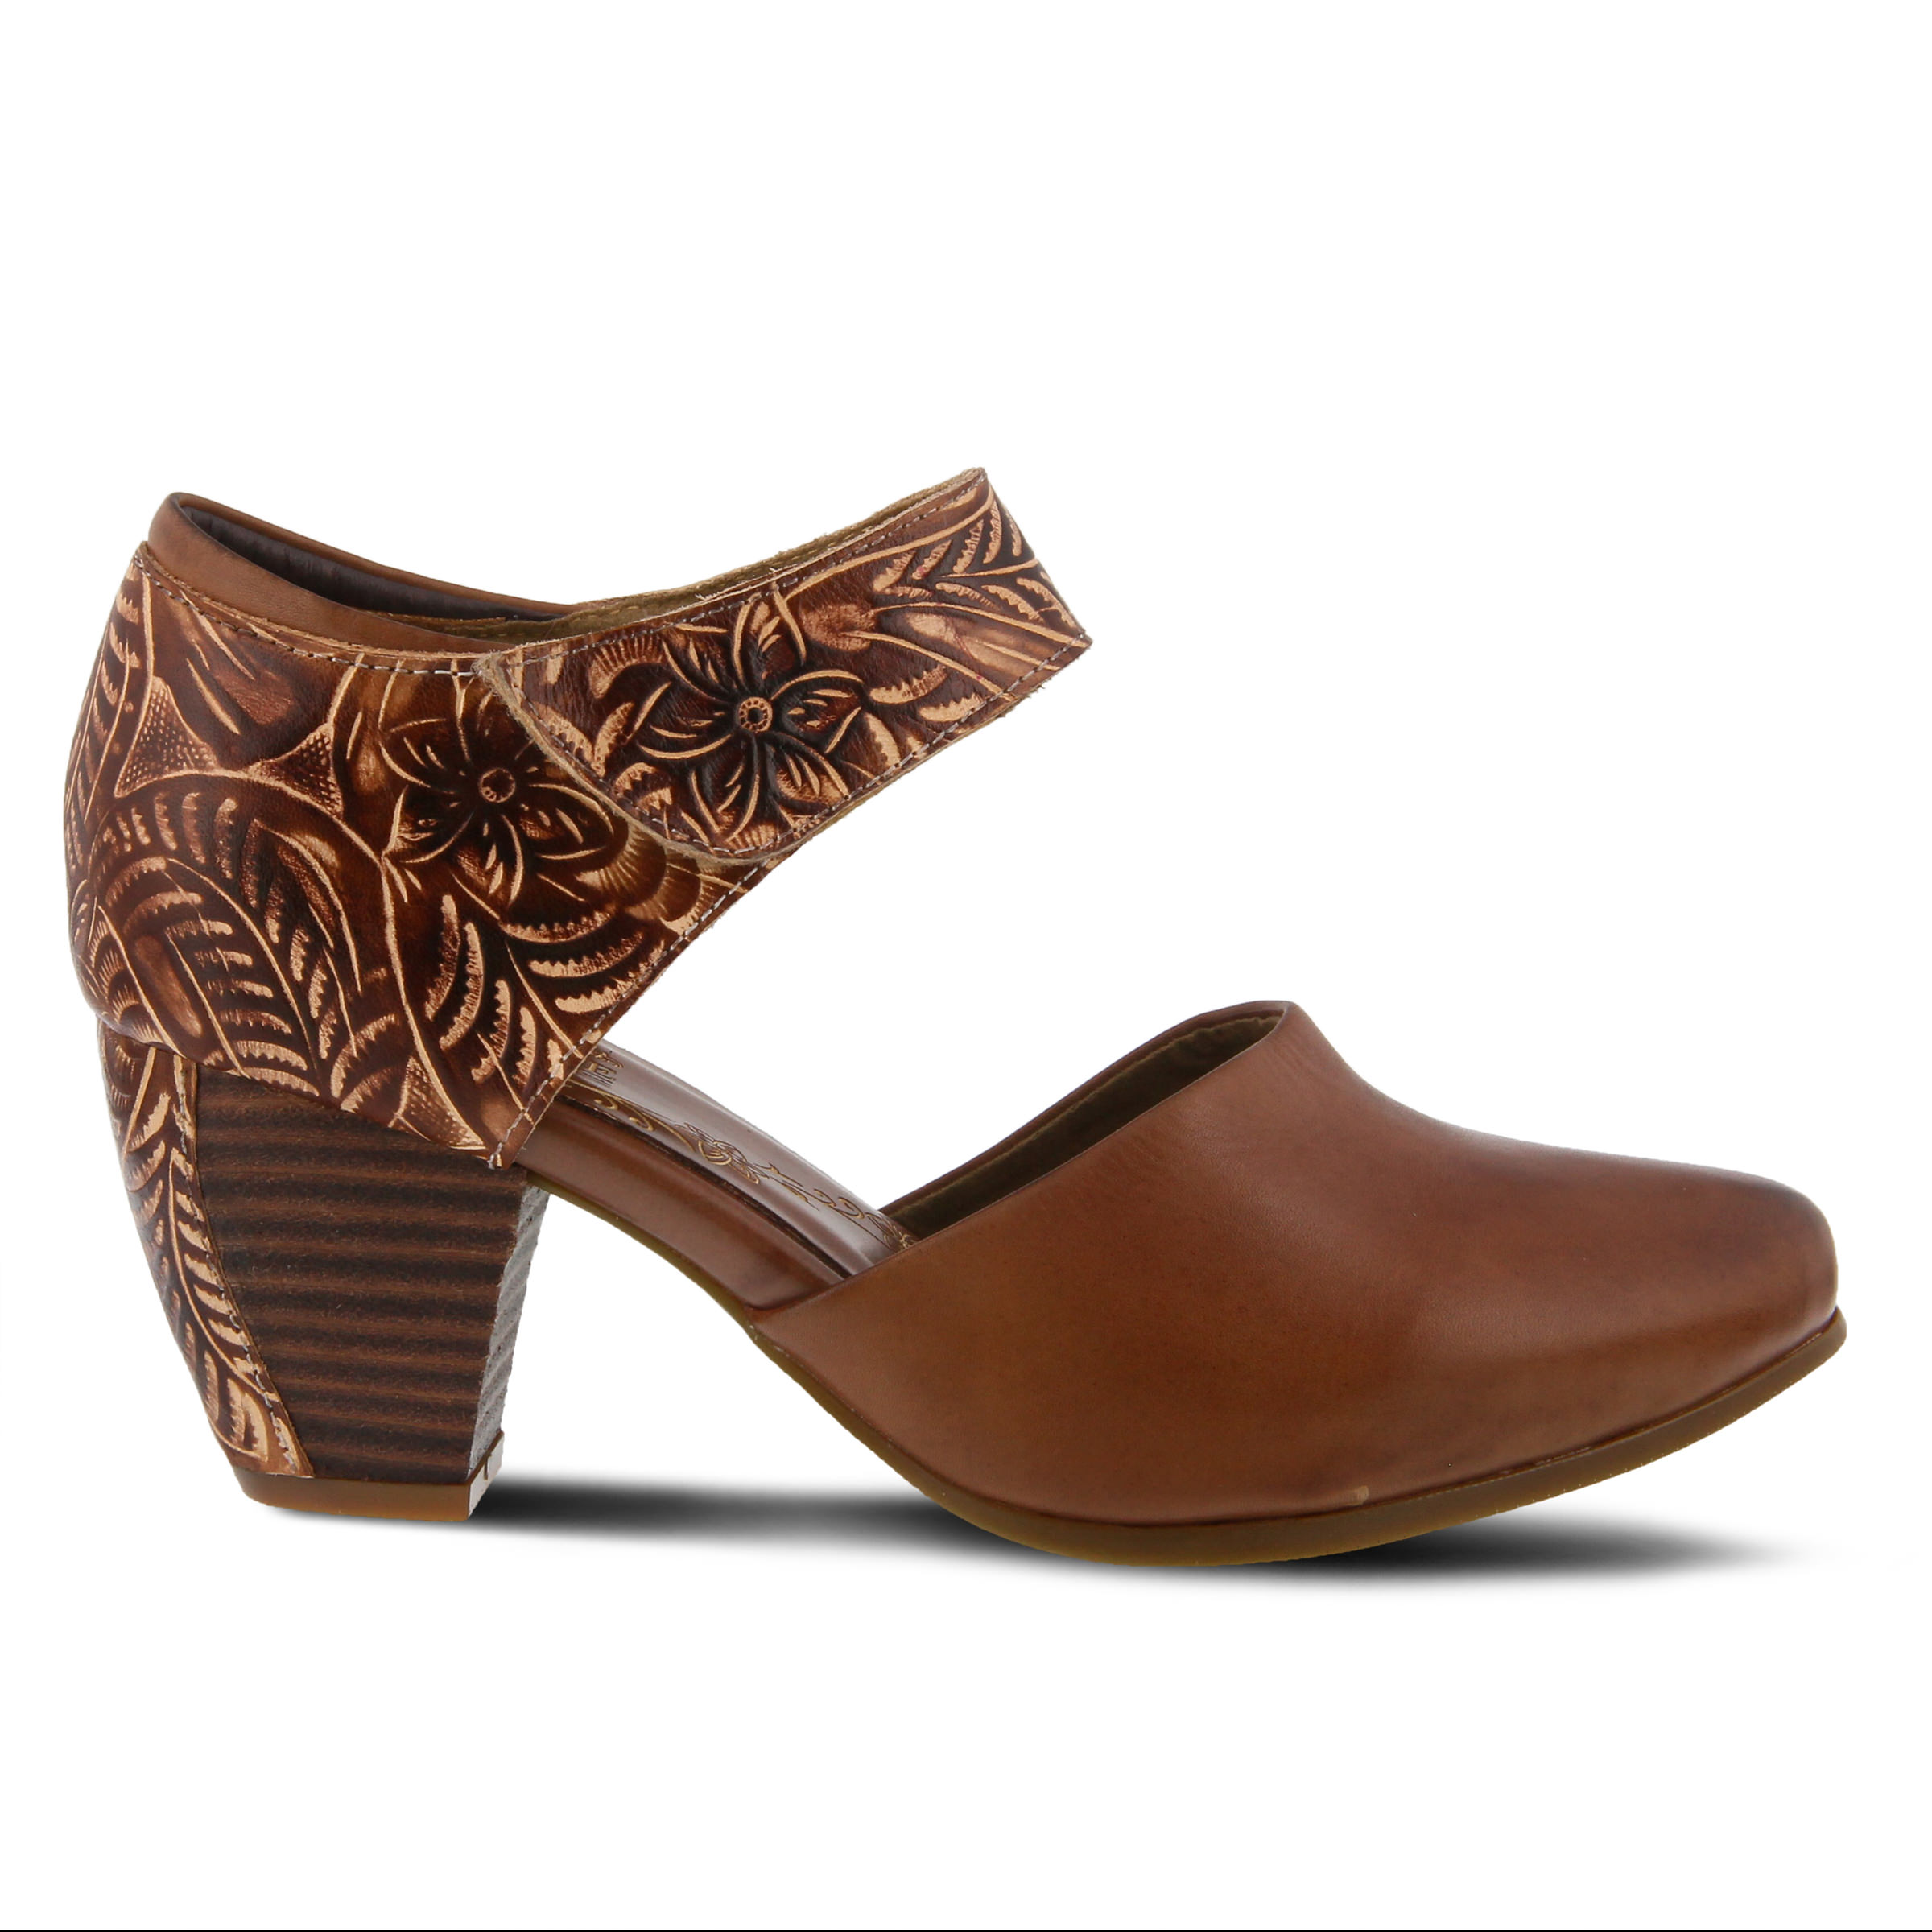 L'Artiste Toolie Women's Dress Shoe (Brown Leather)